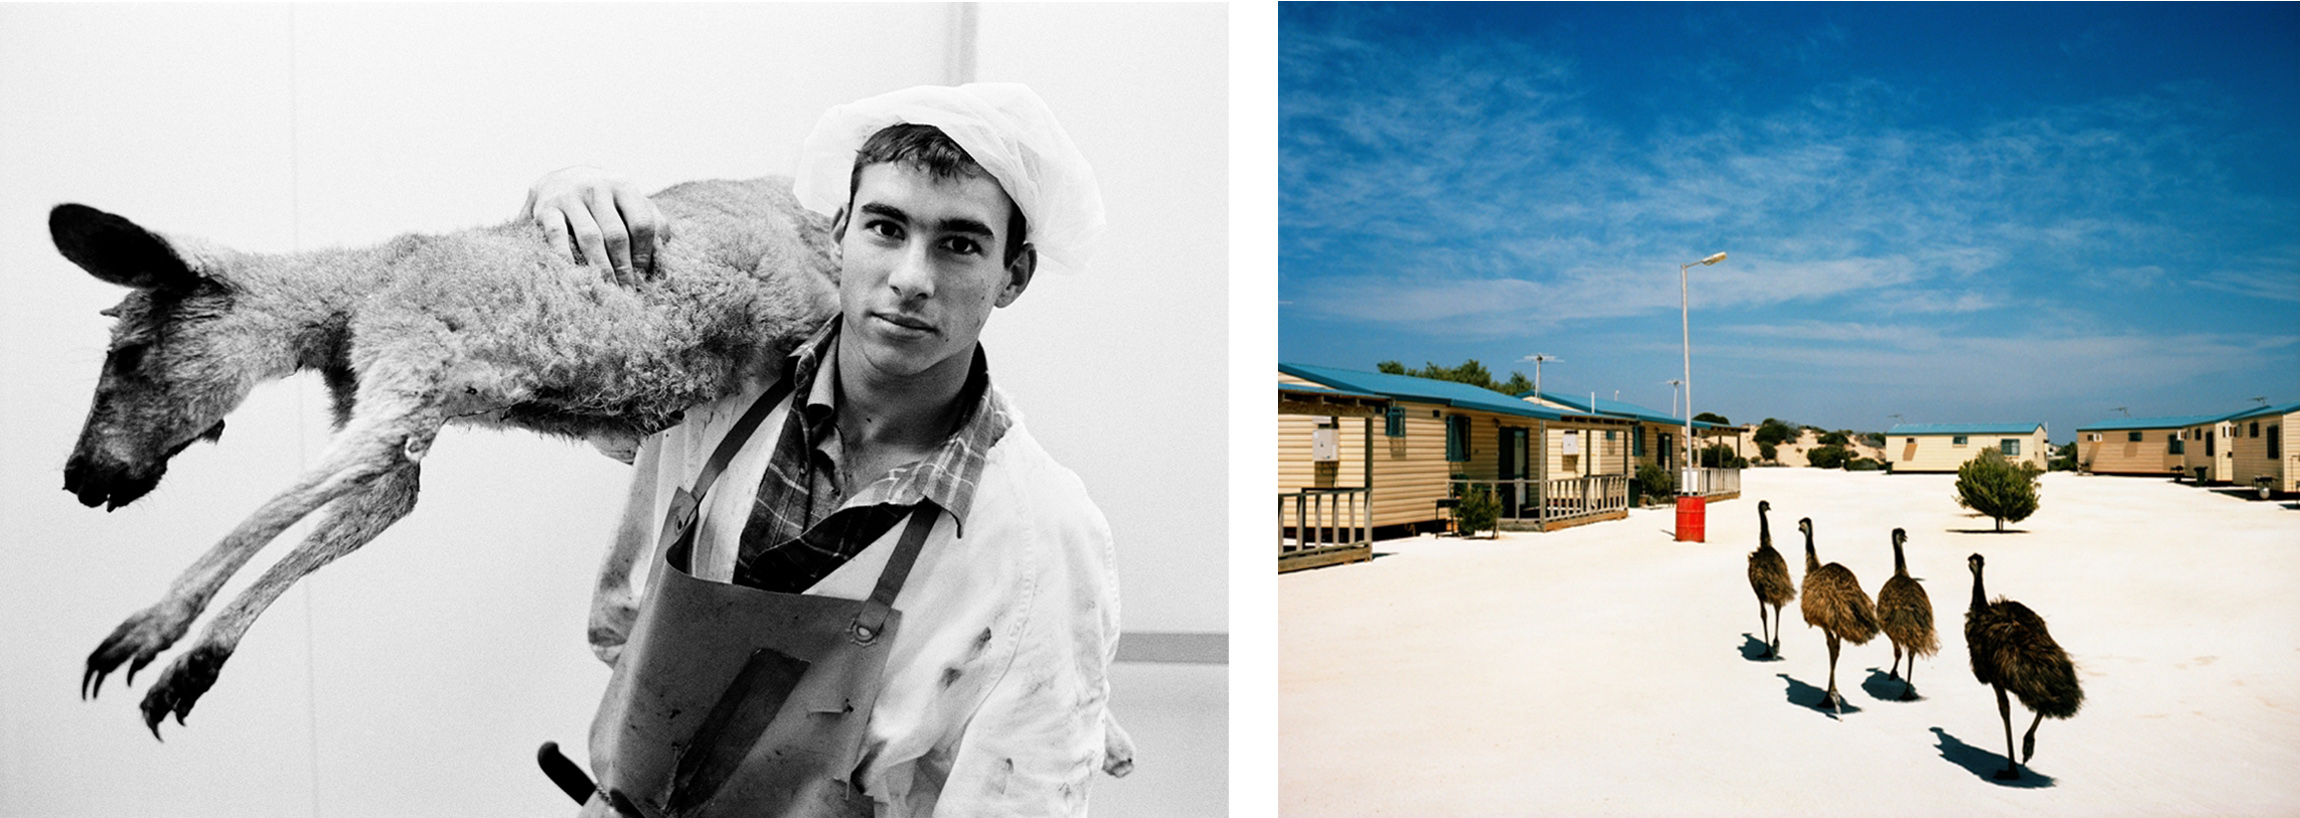 iris, irismagazine, iris magazine, Paul Blackmore, Trent Parke, Australian Photography